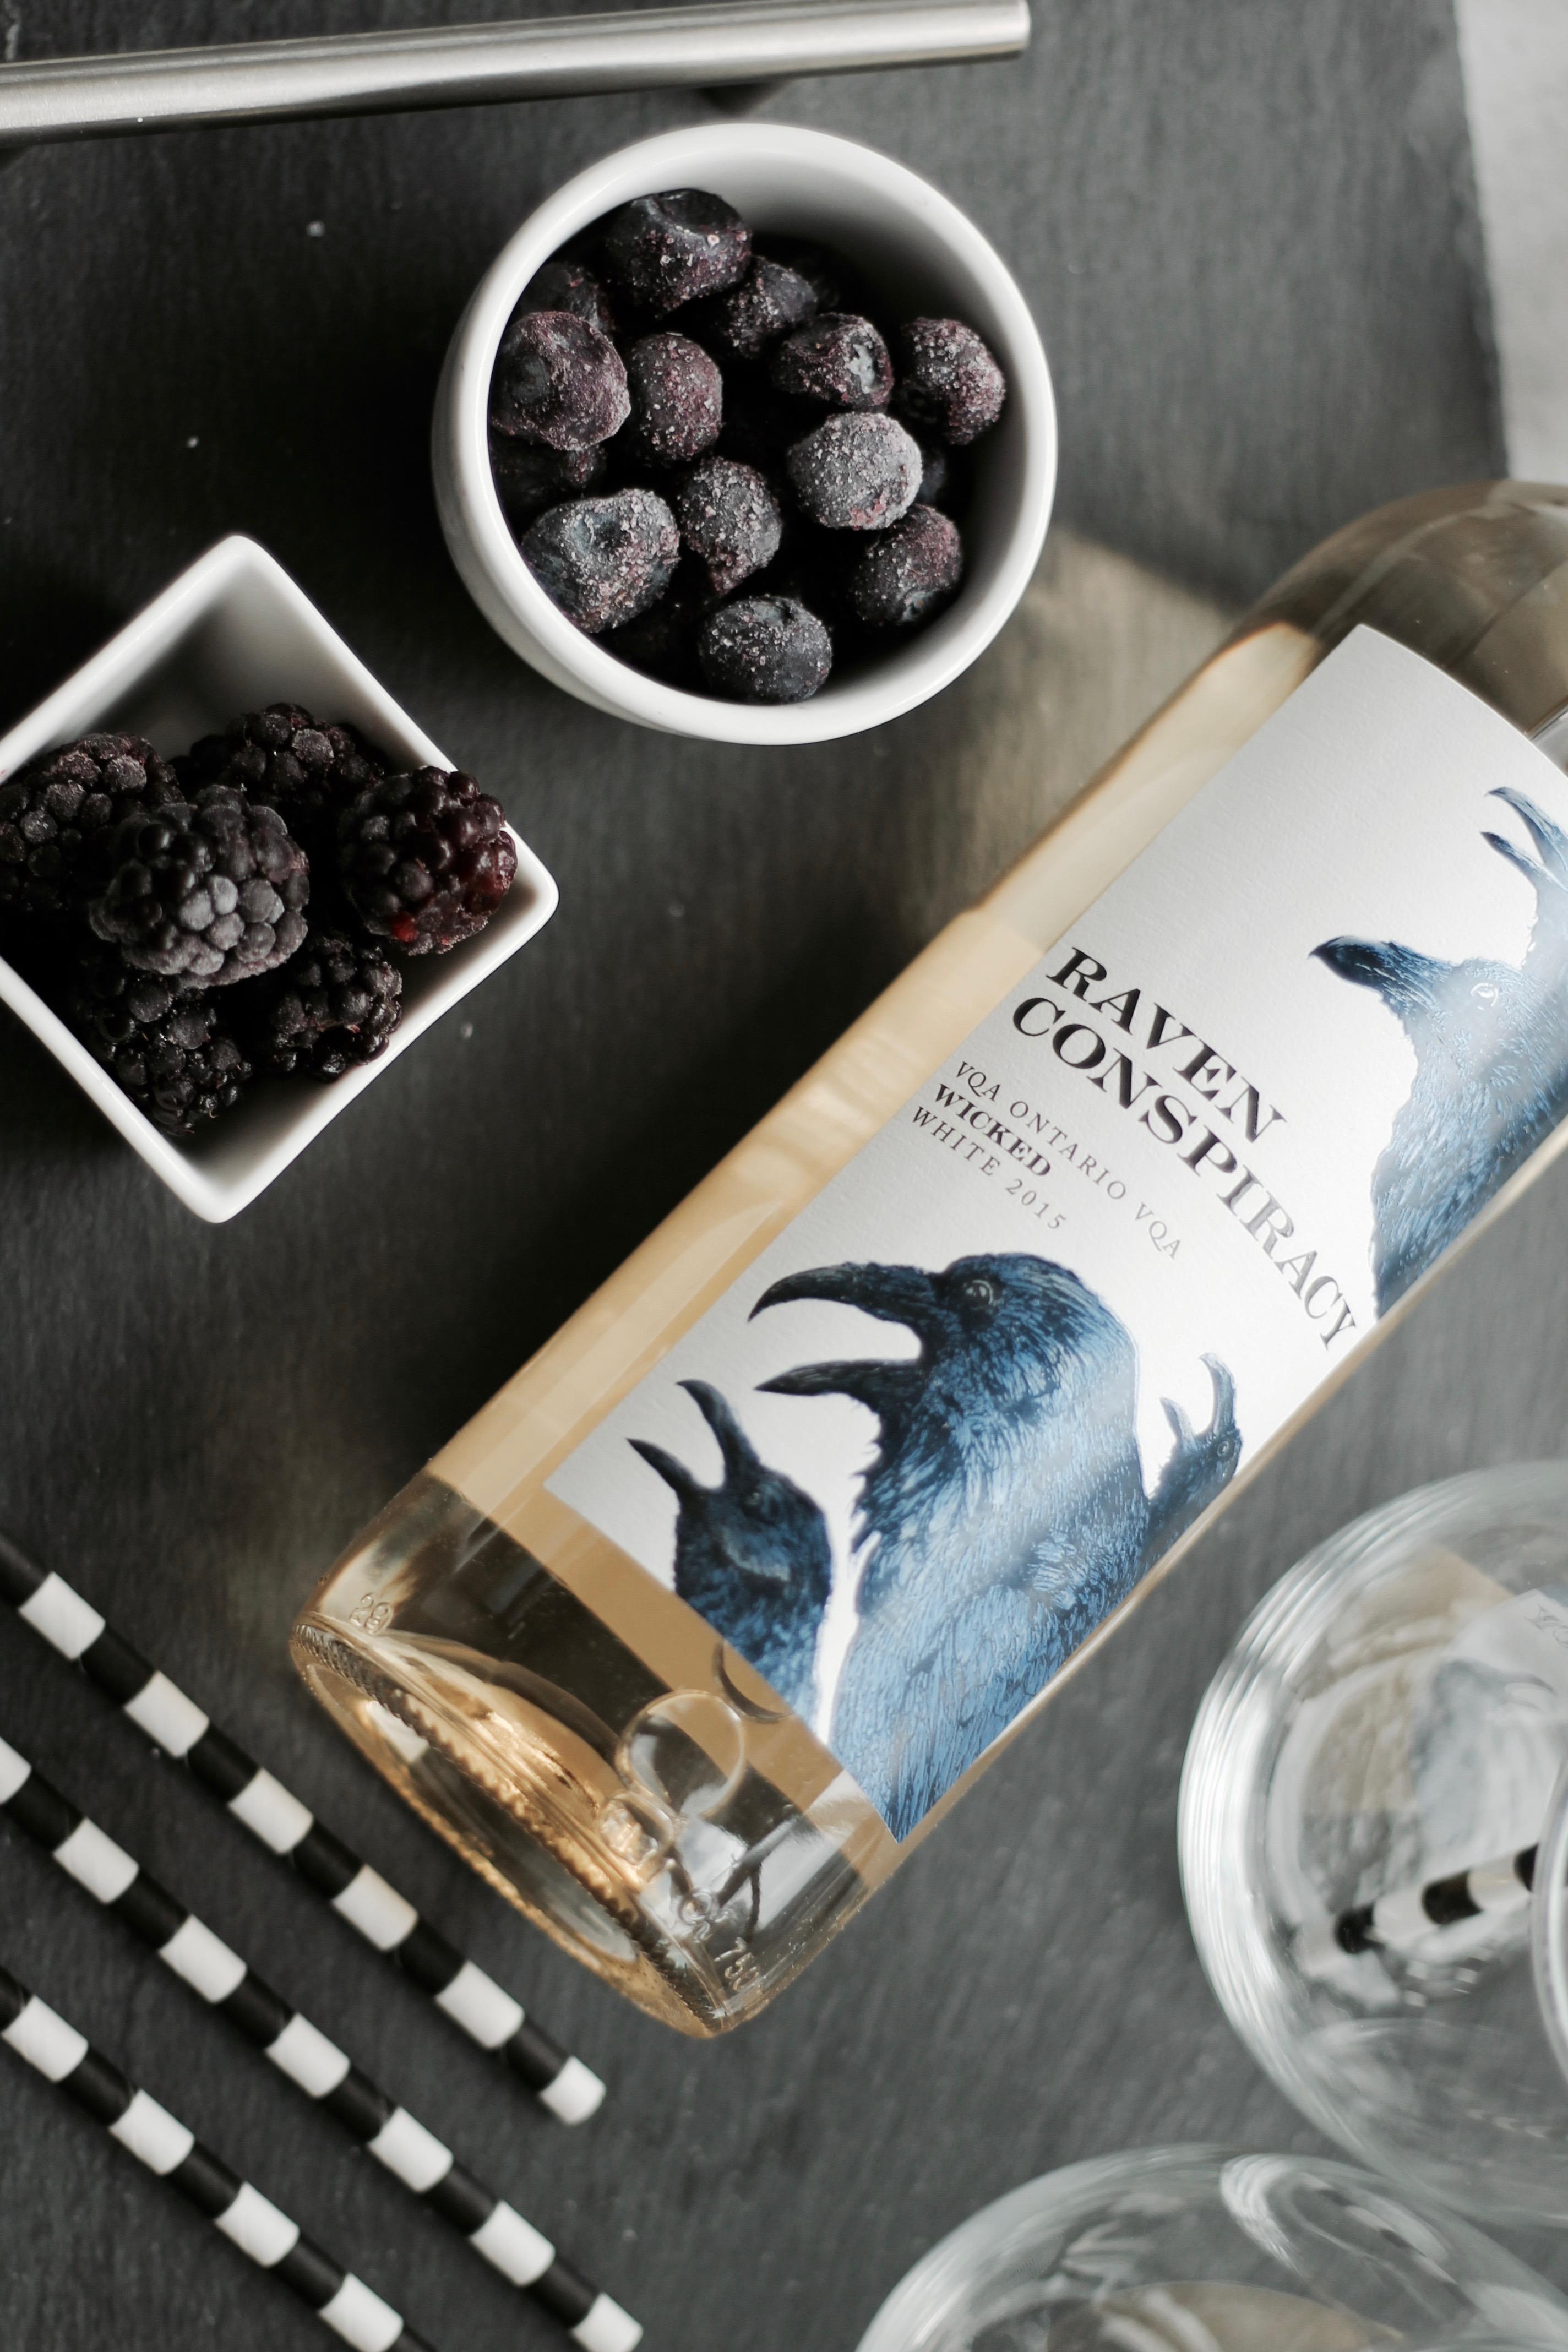 MON MODE Blog | Mon Mode | Fashion Blog | Toronto Blogger | Wine Cocktail | Wine Popsicle Cocktail | Raven Conspiracy